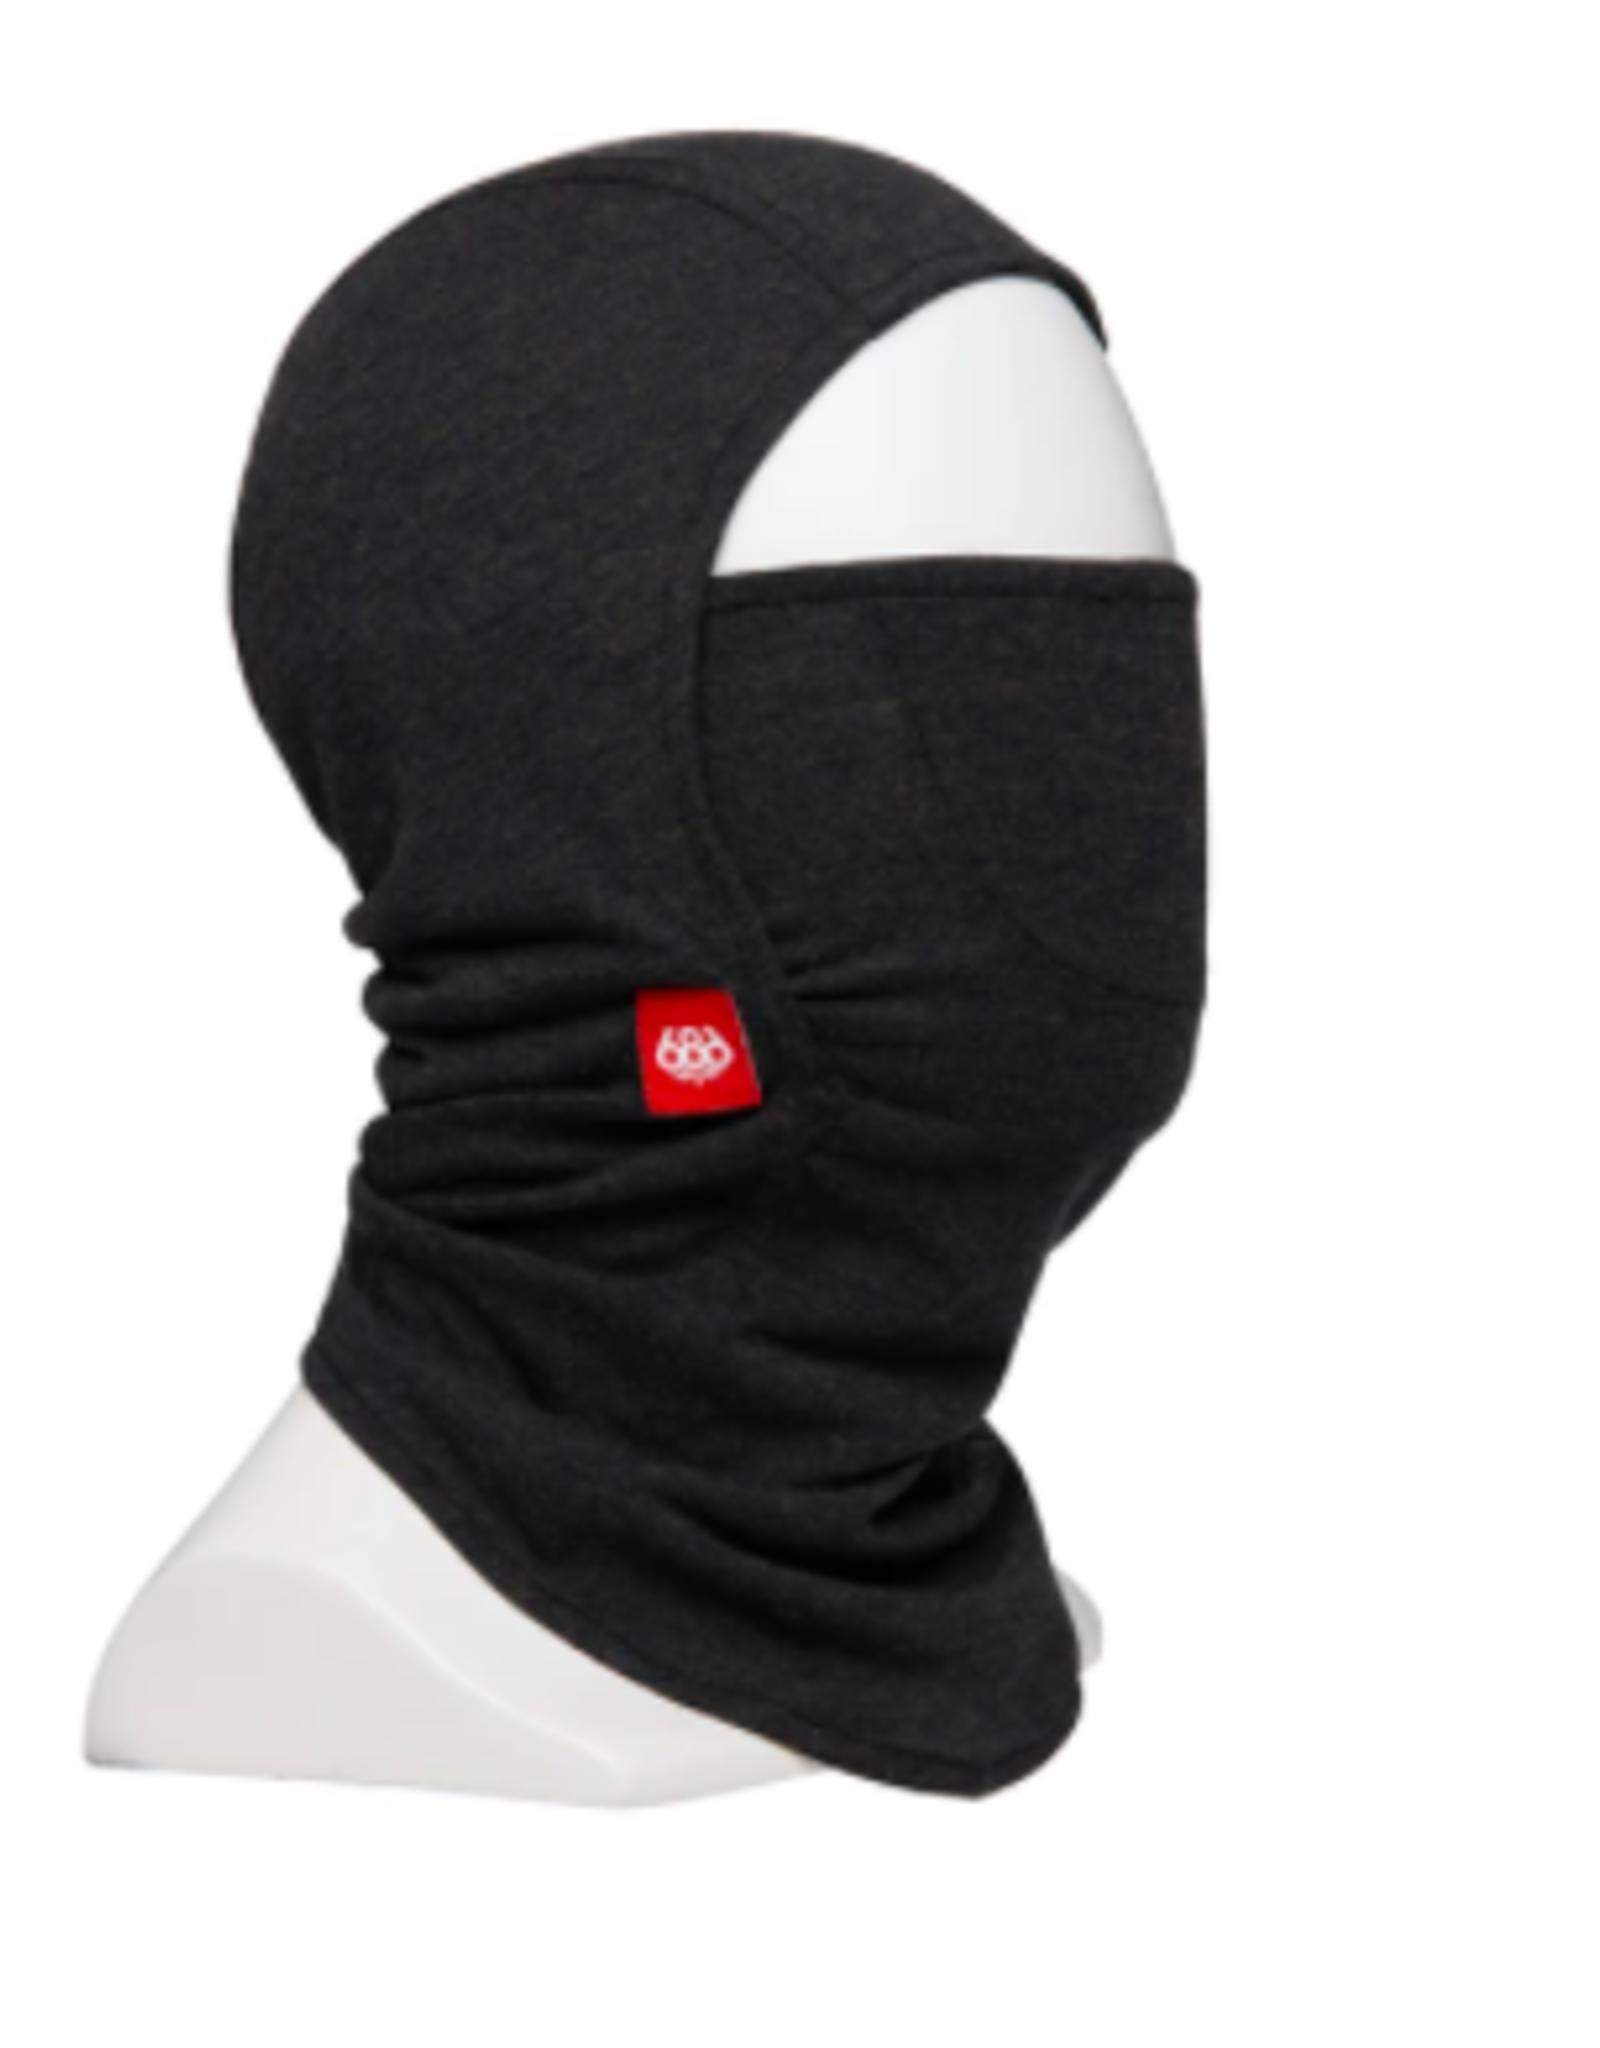 686 Deluxe Hinged Merino Balaclava Face Mask Black Heather 2022